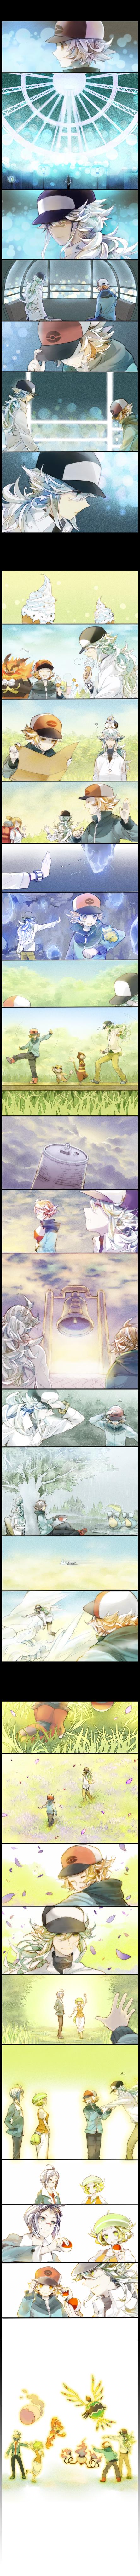 Tags: Anime, Yuuichi-87, Pokémon, Reshiram, Pansear, N (Pokémon), Palpitoad, Chandelure, Musharna, Sigilyph, Patrat, Pidove, Bel (Pokémon)